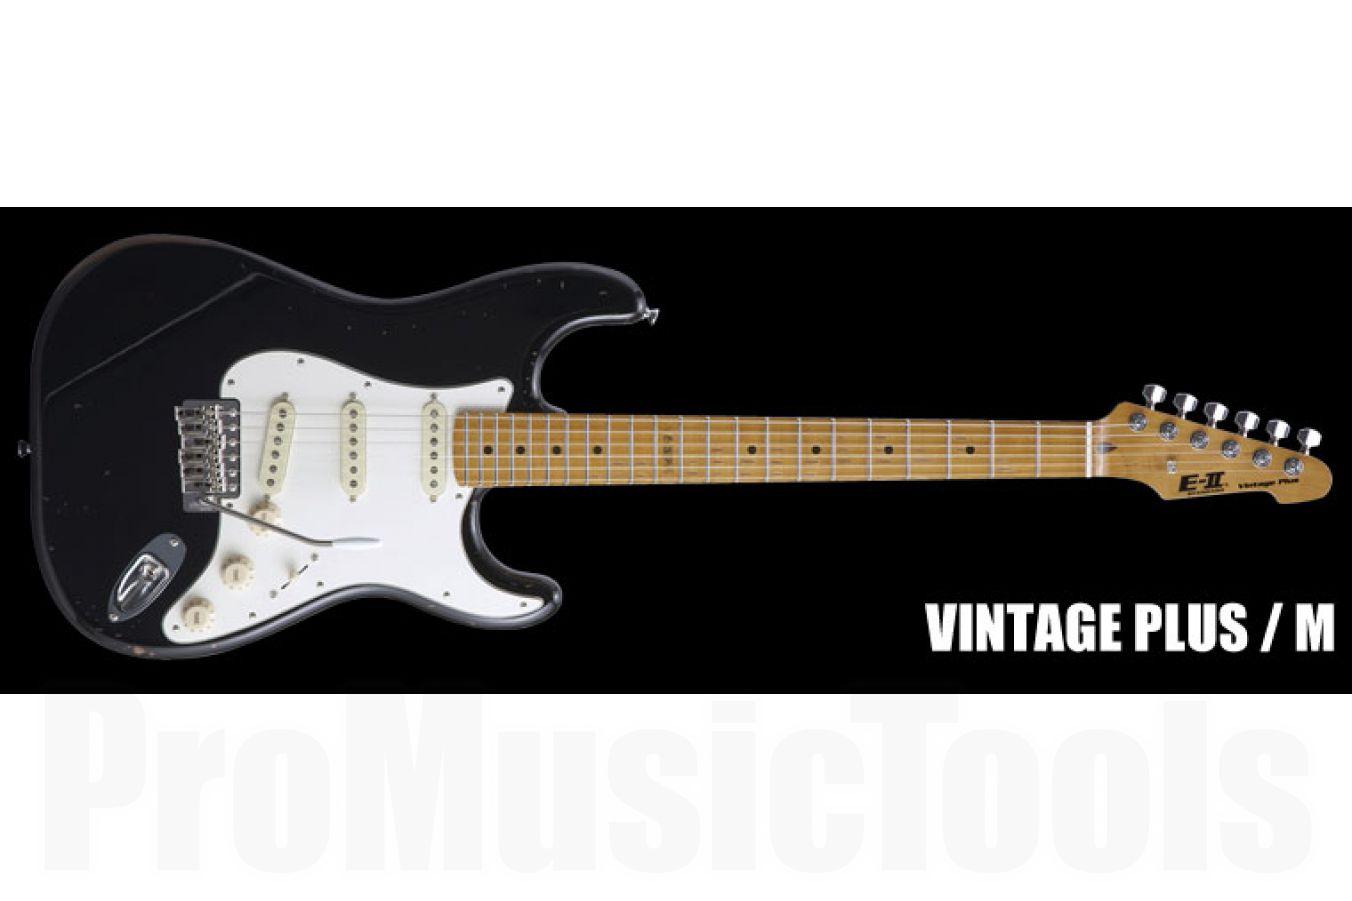 ESP E-II Vintage Plus /M Distressed BK - Black